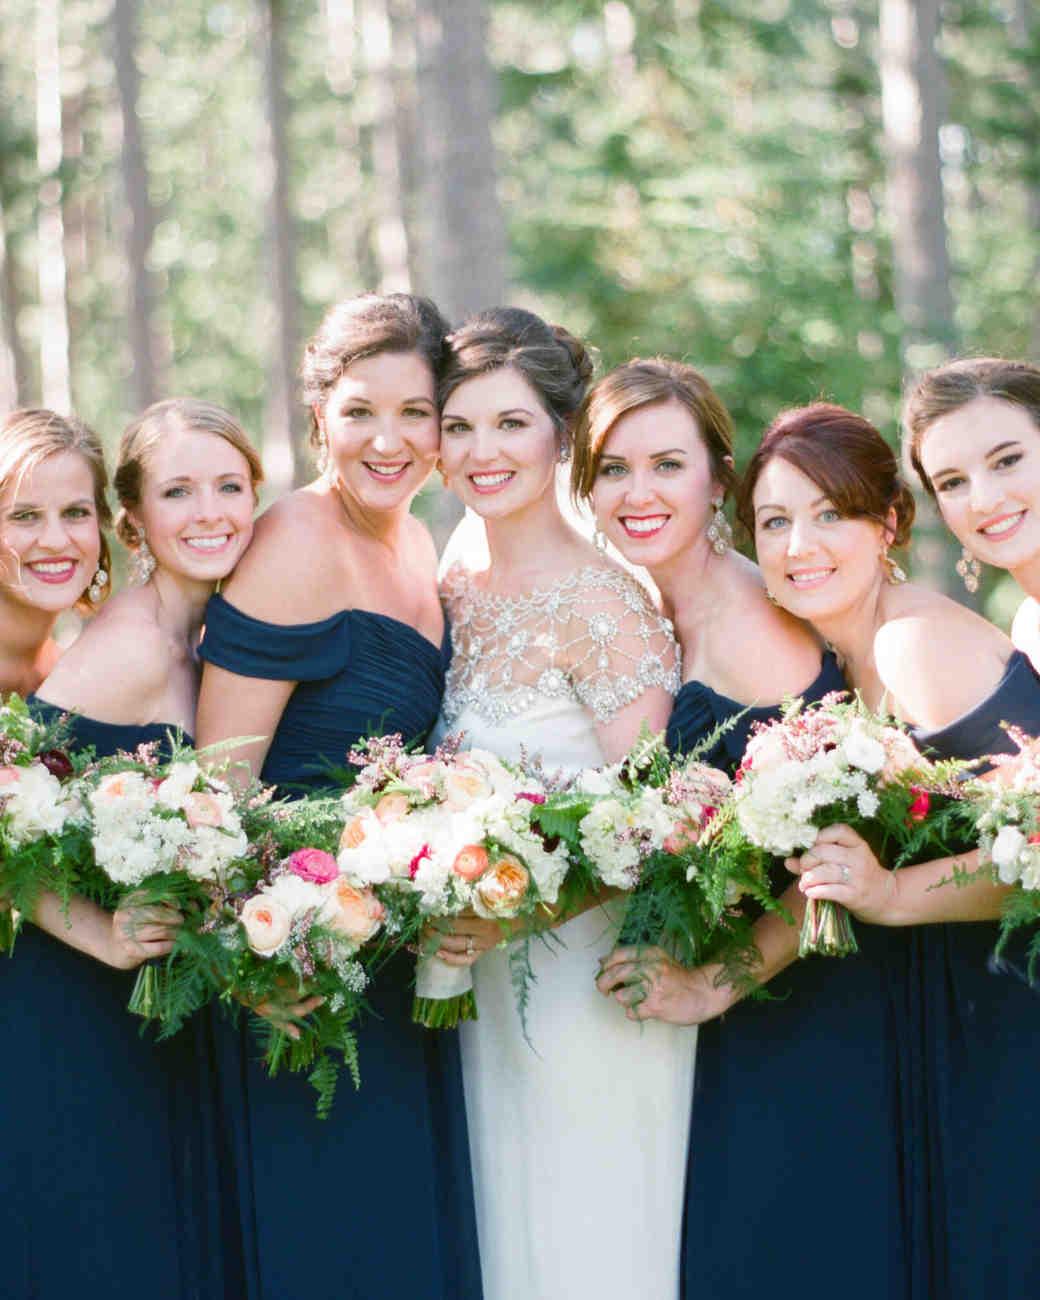 sara-nick-wedding-bridesmaids-227-s111719-1214.jpg